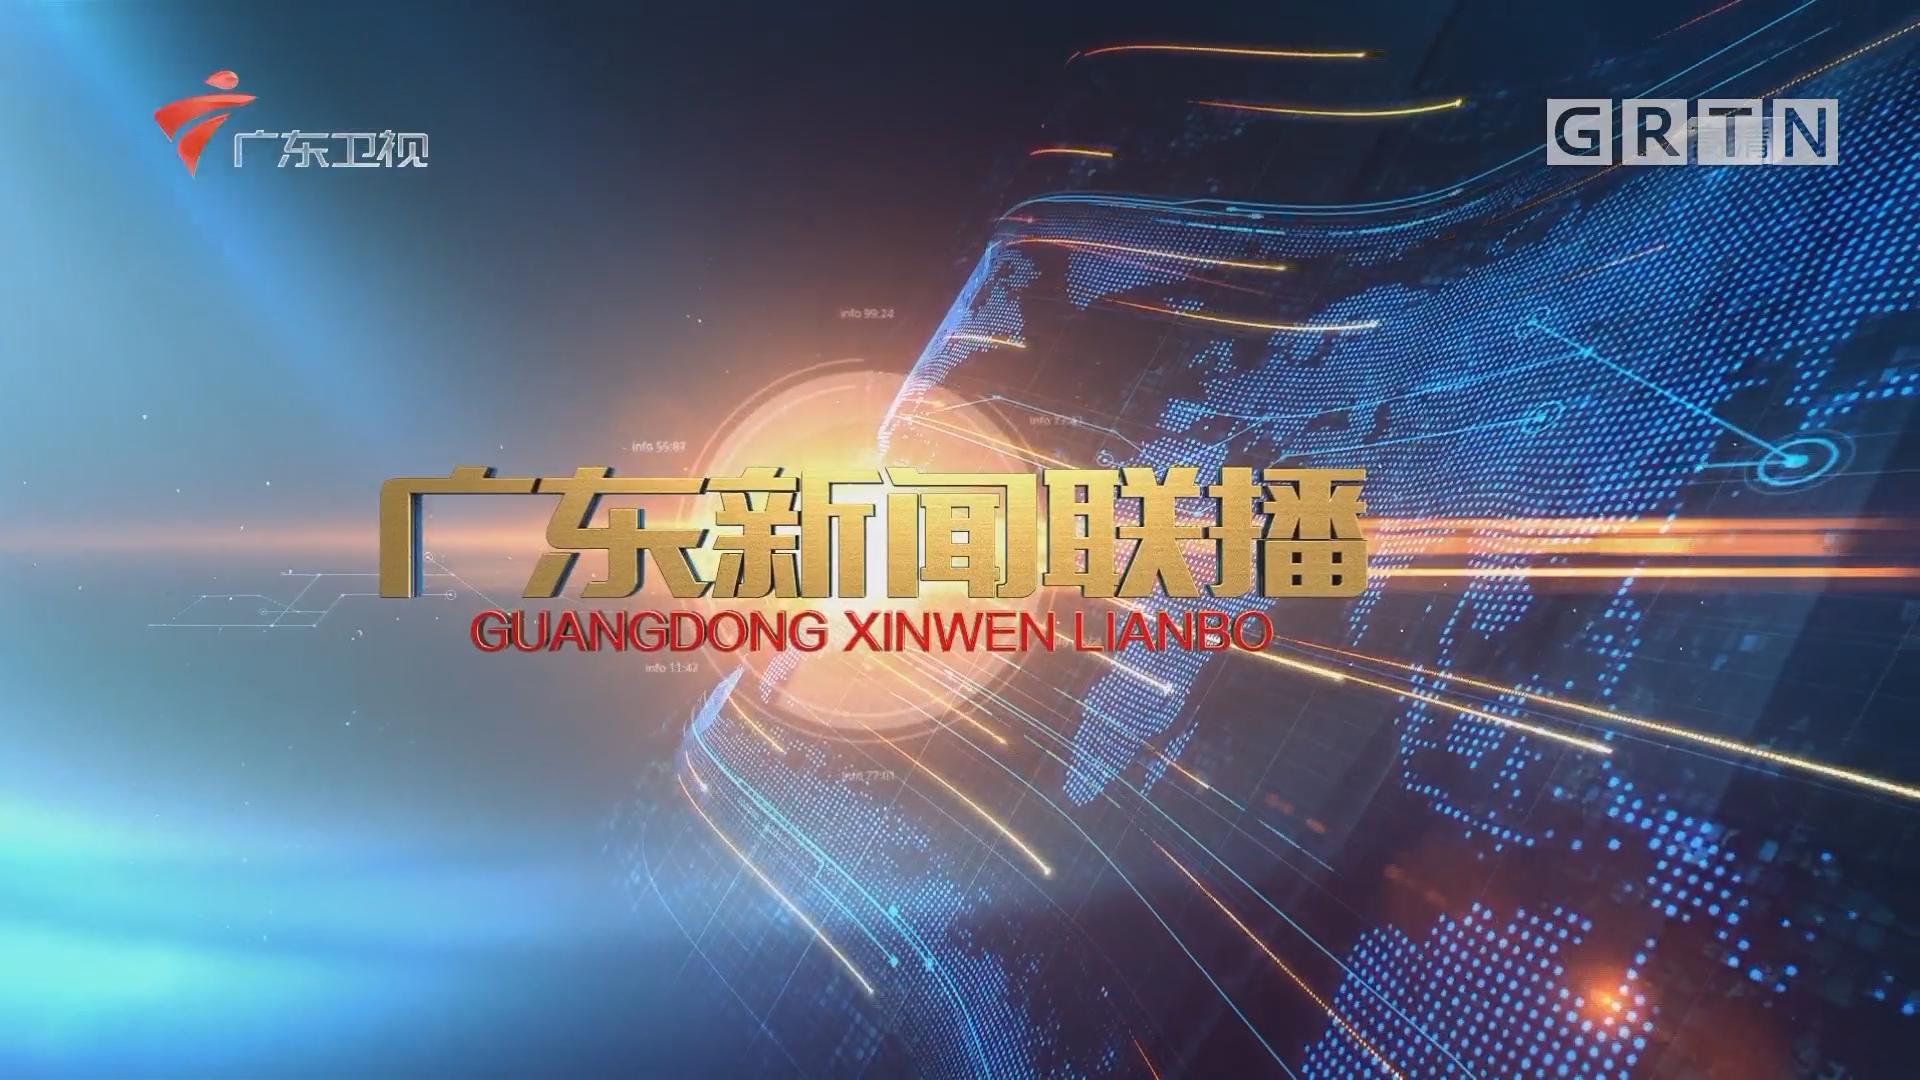 [HD][2018-09-24]广东新闻联播:科技部与广东签署新一轮会商合作议定书 李希见证签约 王志刚马兴瑞出席会商会议